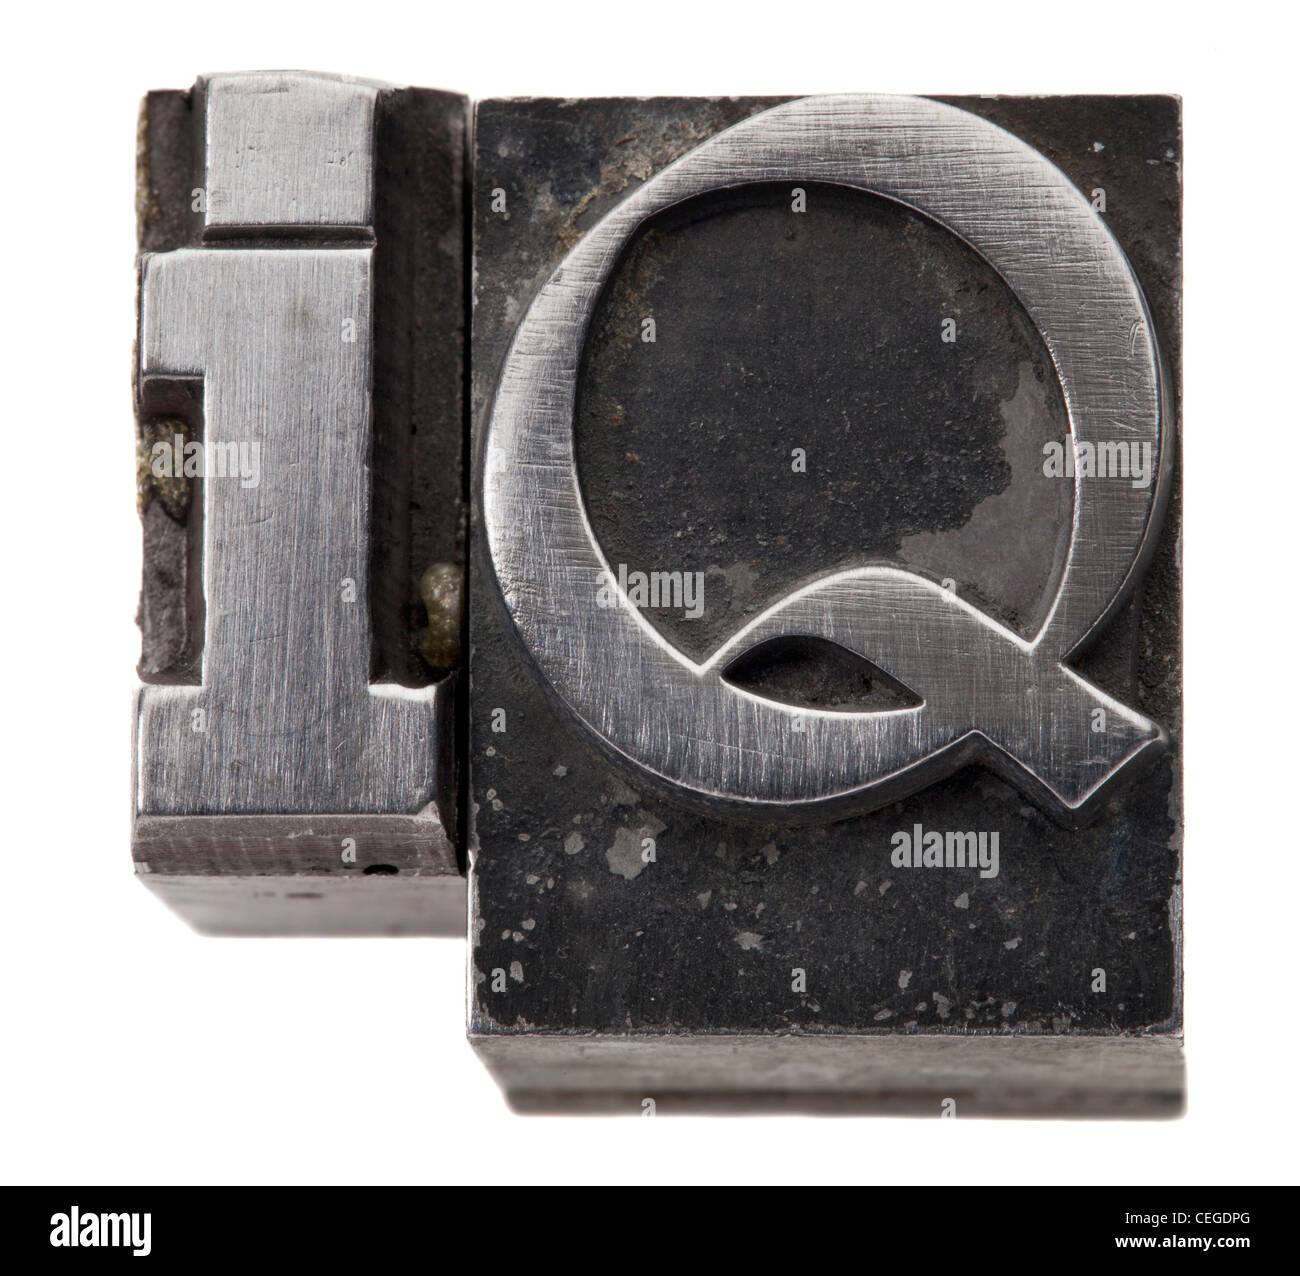 Intelligence quotient - IQ acronym - isolated symbol in vintage grunge metal type - Stock Image